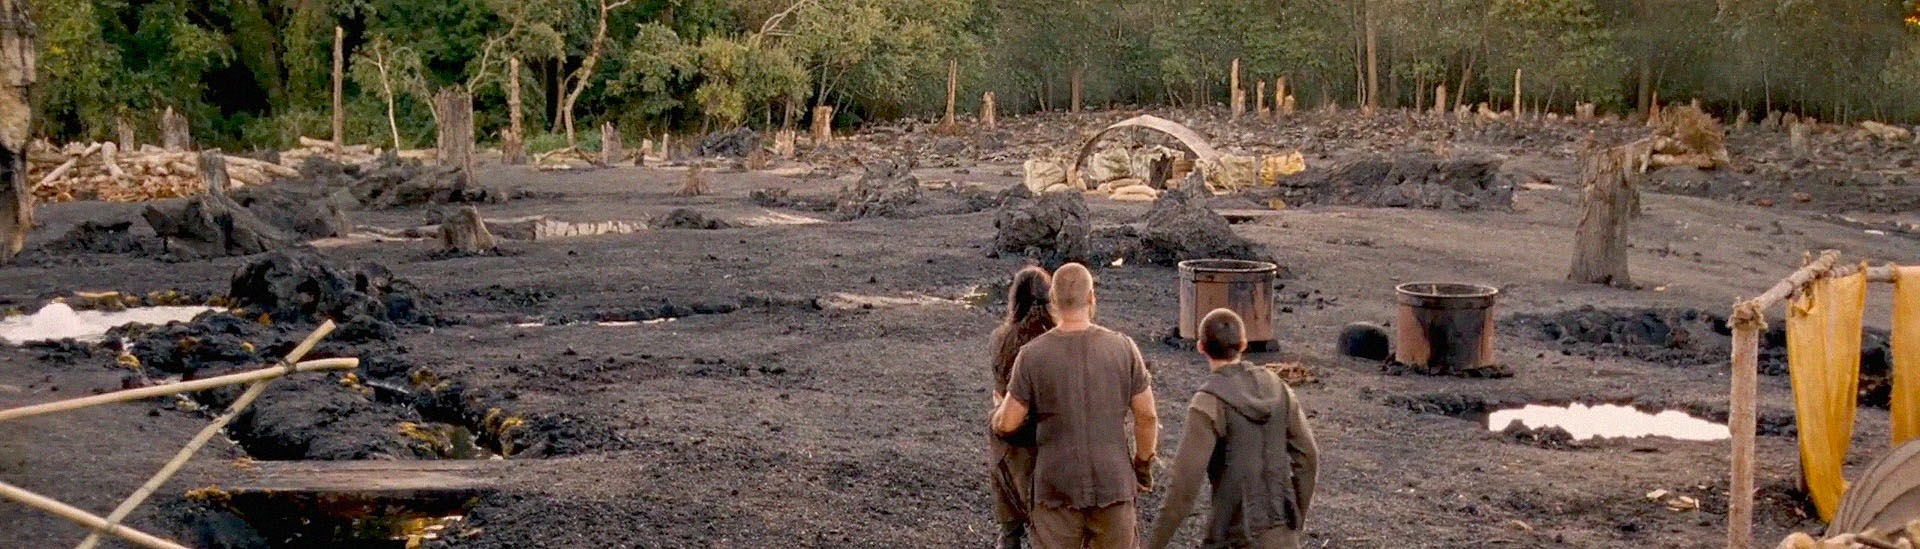 Baner filmu 'Noe: Wybrany Przez Boga'